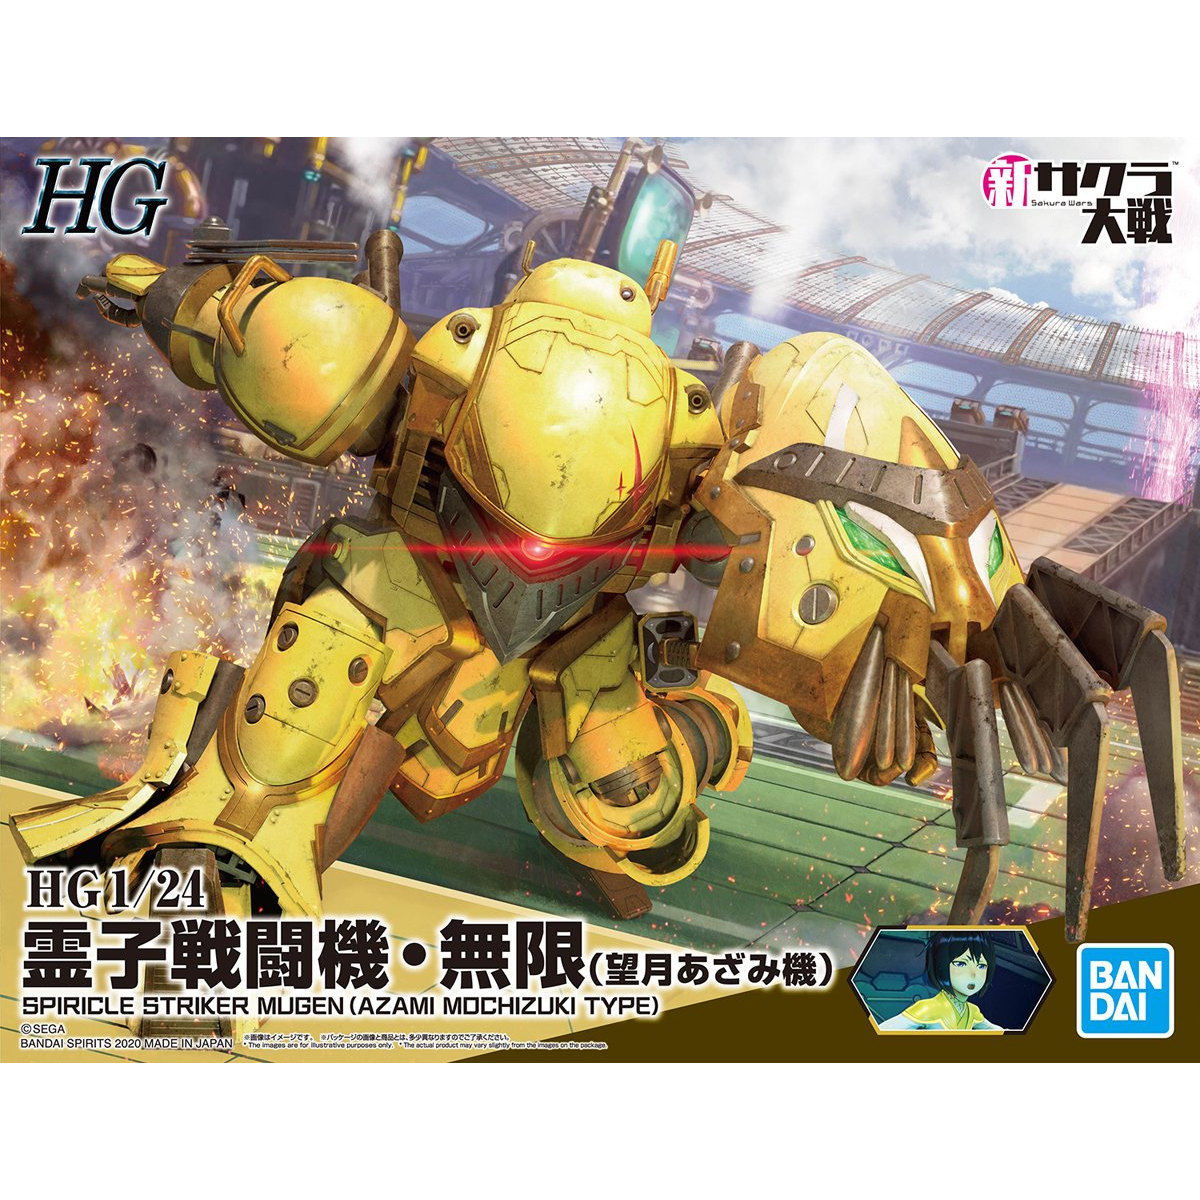 GUNDAM.MY: [SAKURA WARS] HG 1/24 Spiricle Striker Mugen (Azami Mochizuki Type) landed